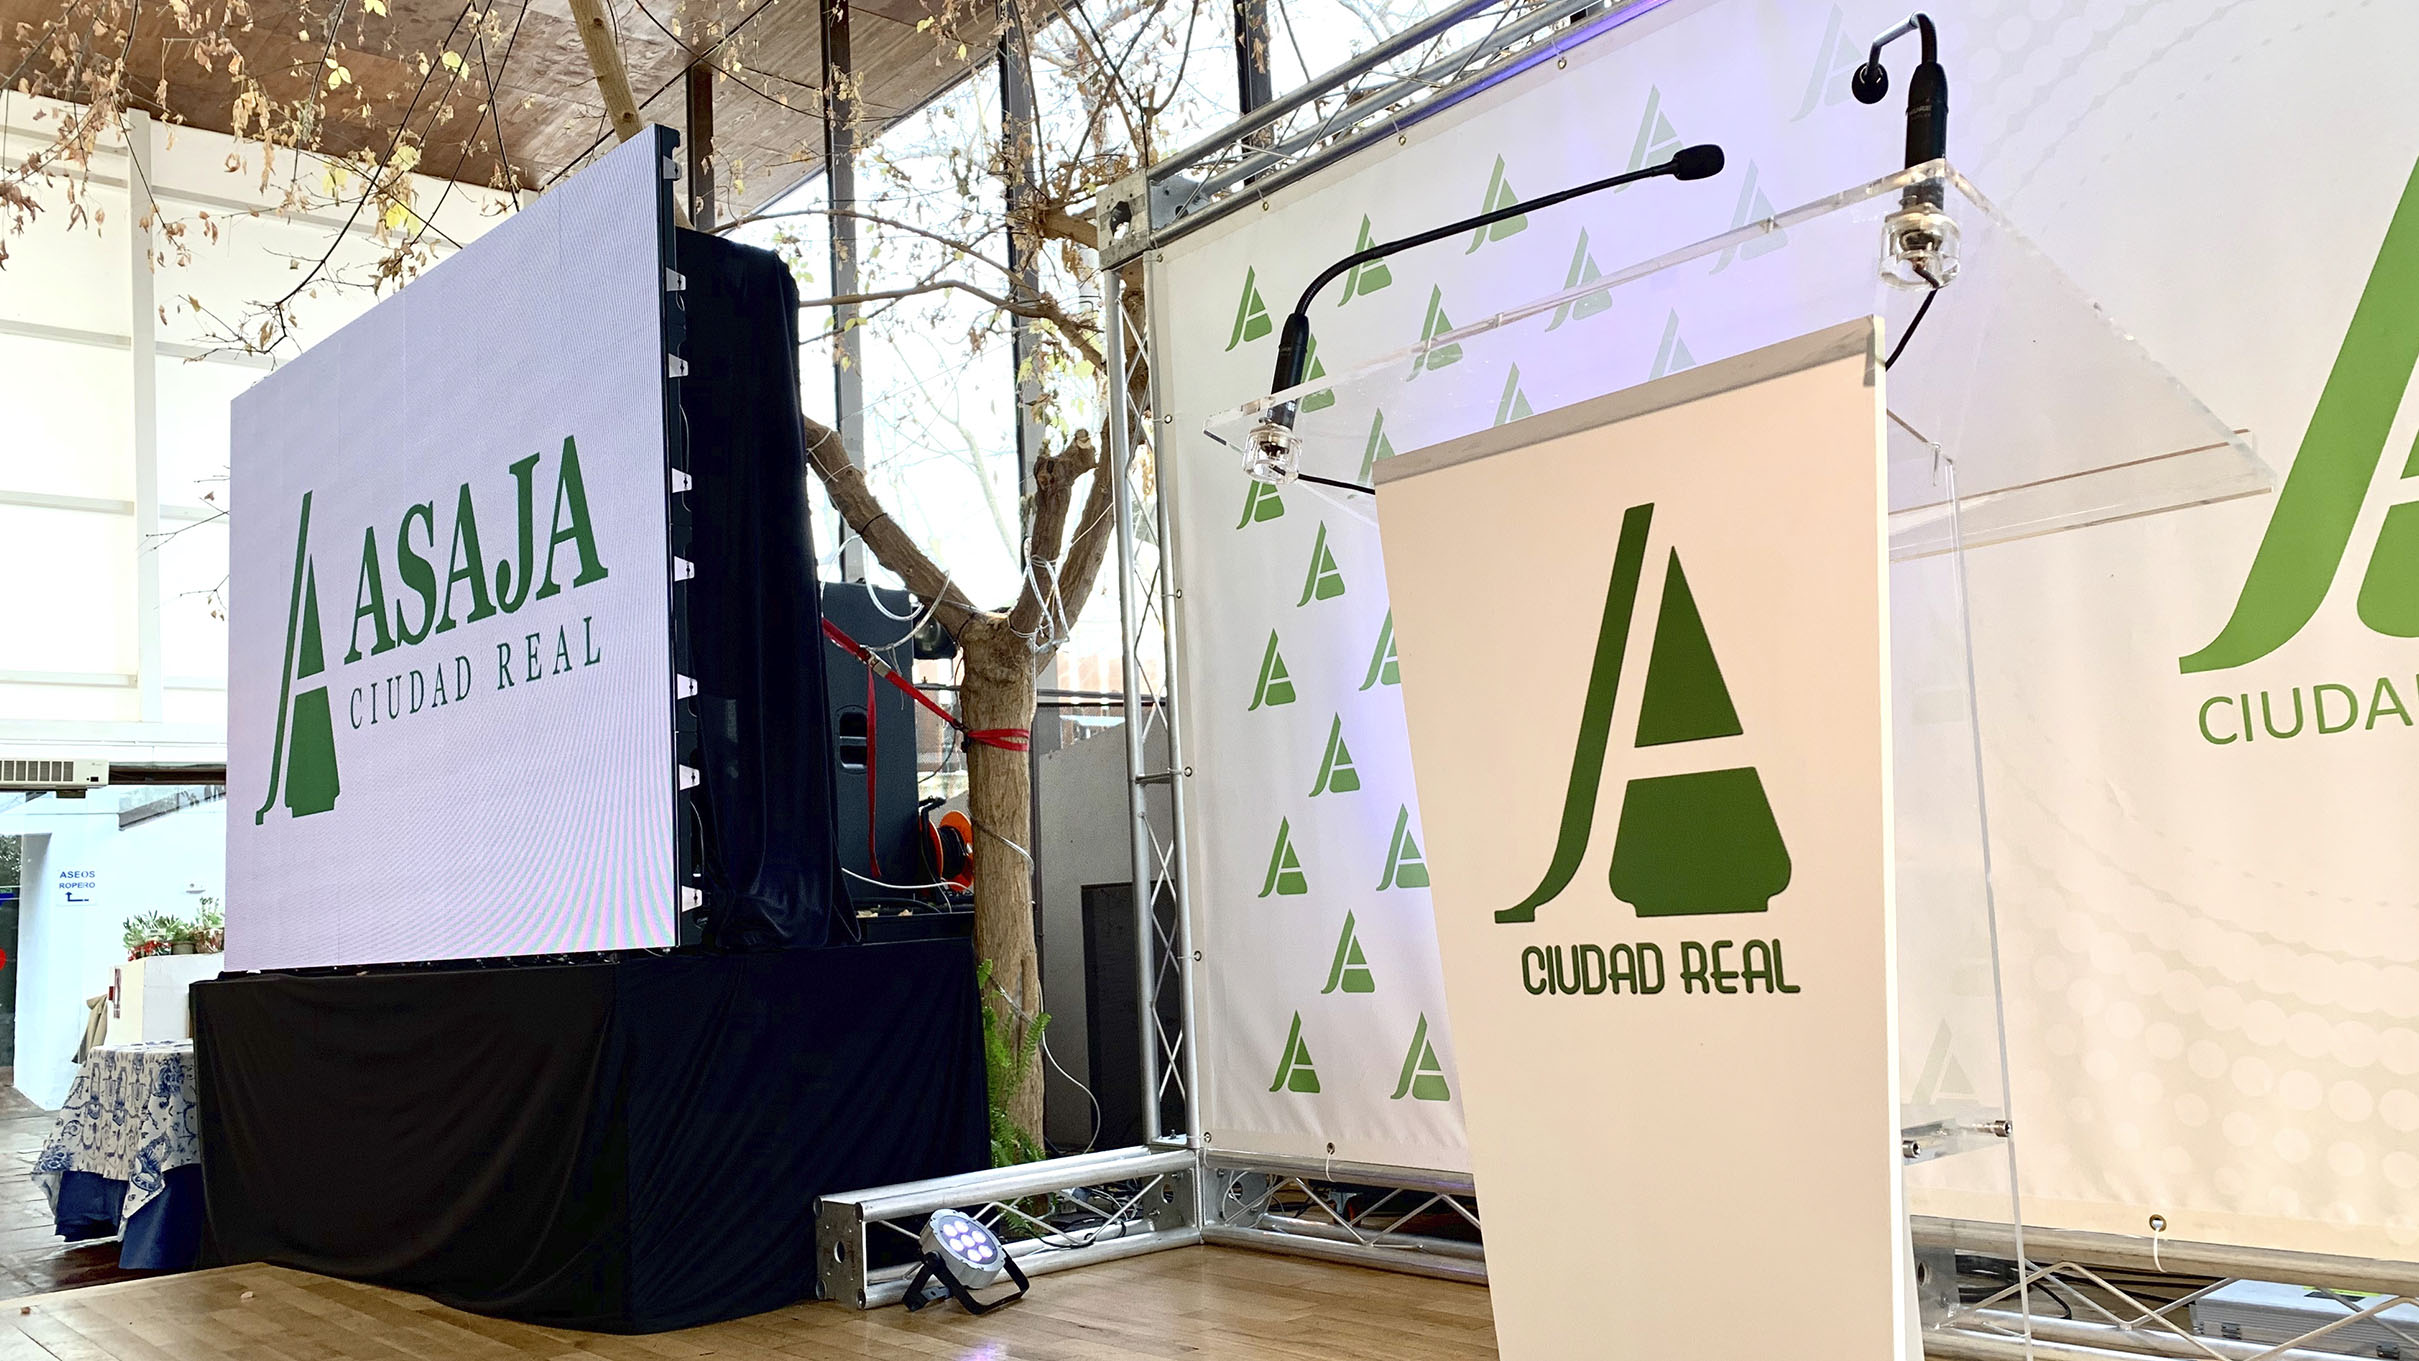 Asaja-Ciudad-Real-2019-05